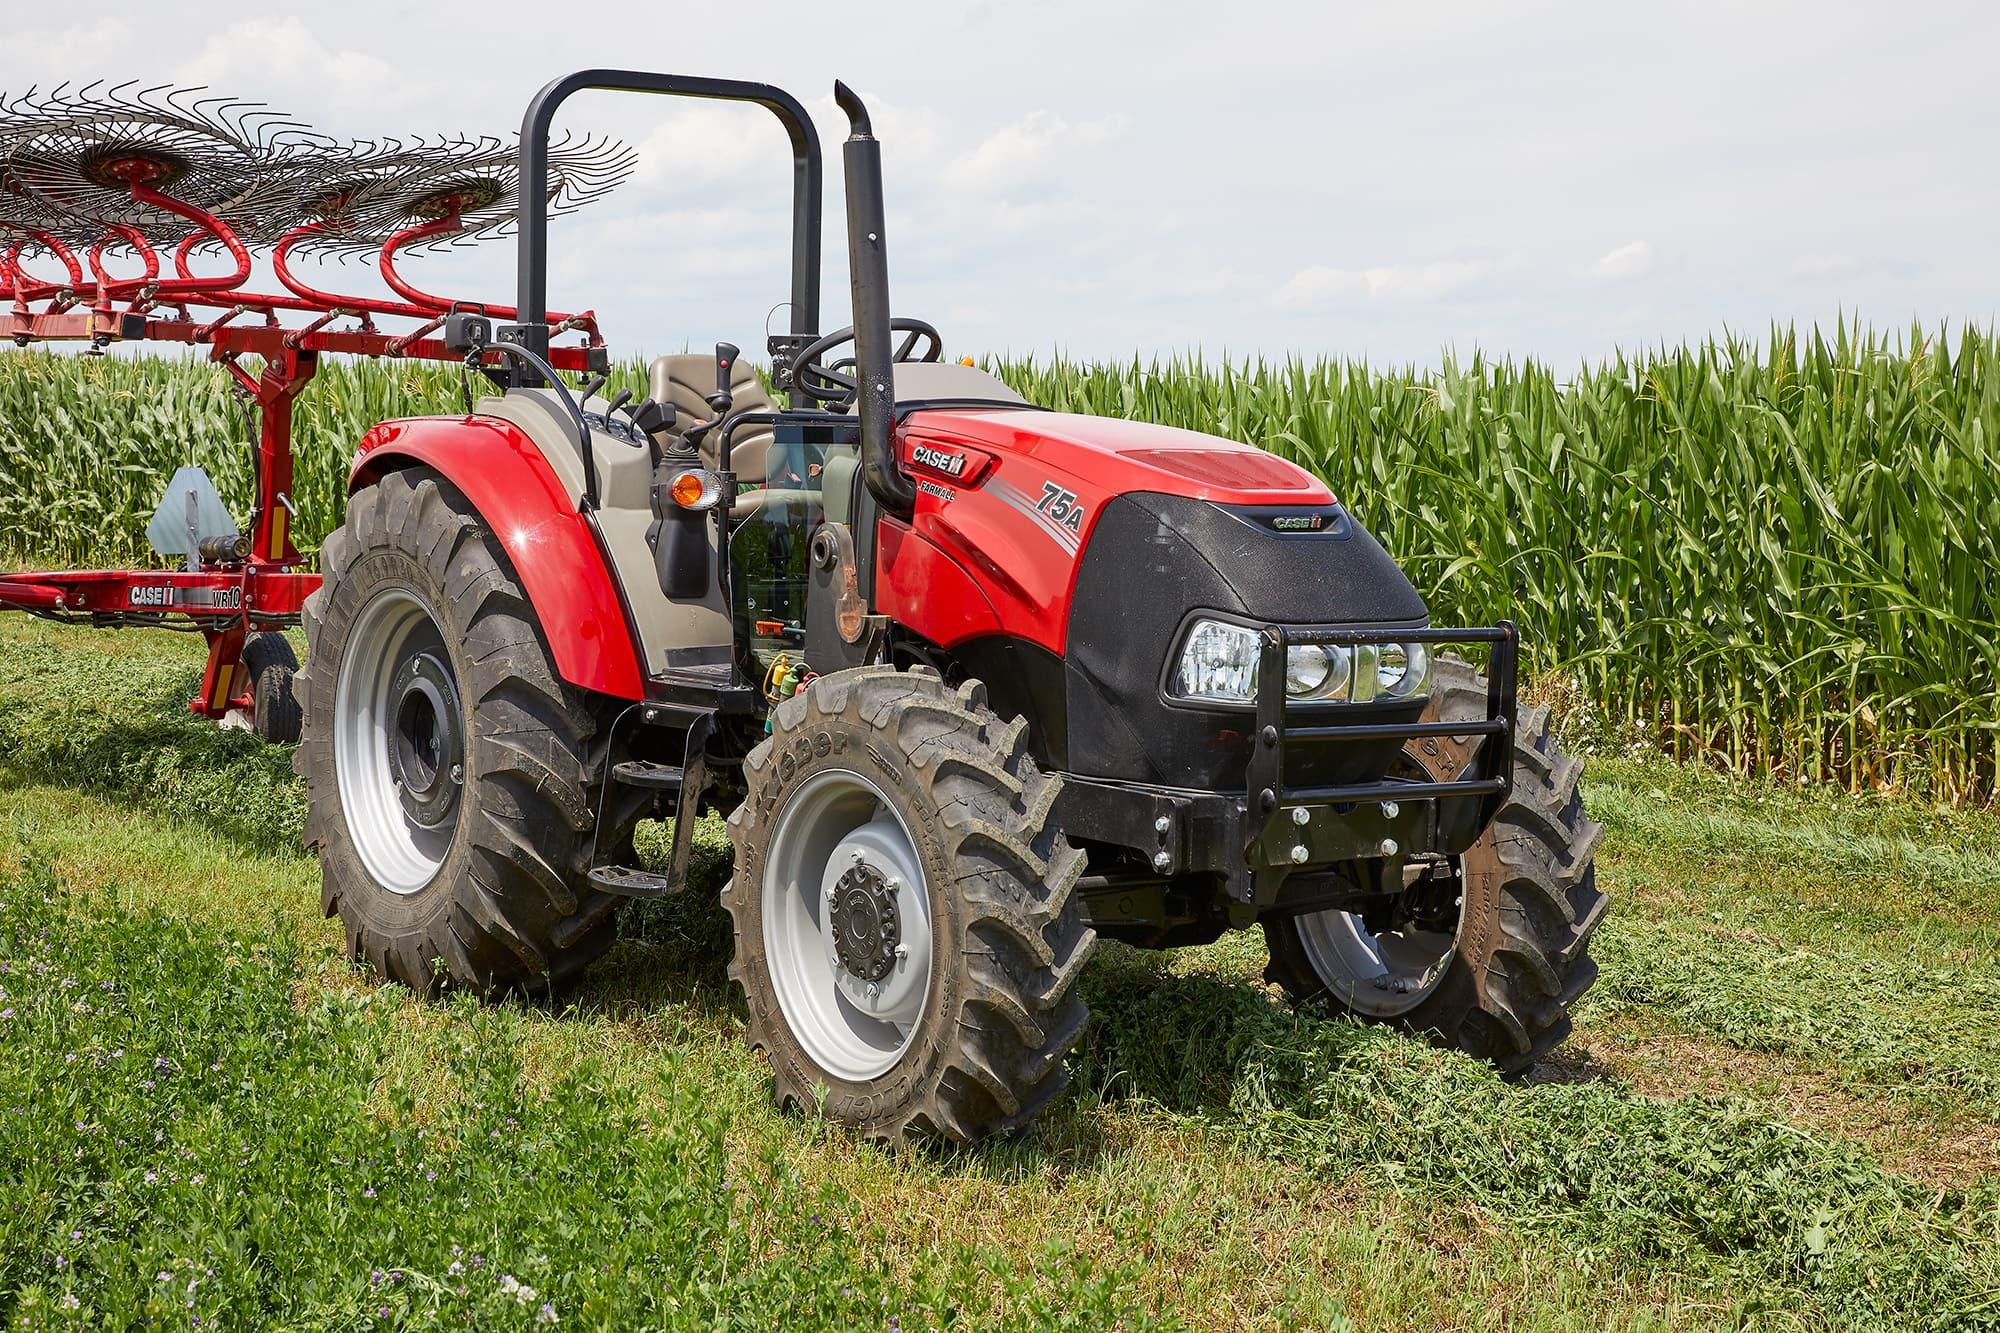 Farmall Utility 75A | Compact Utility Tractors | Case IH